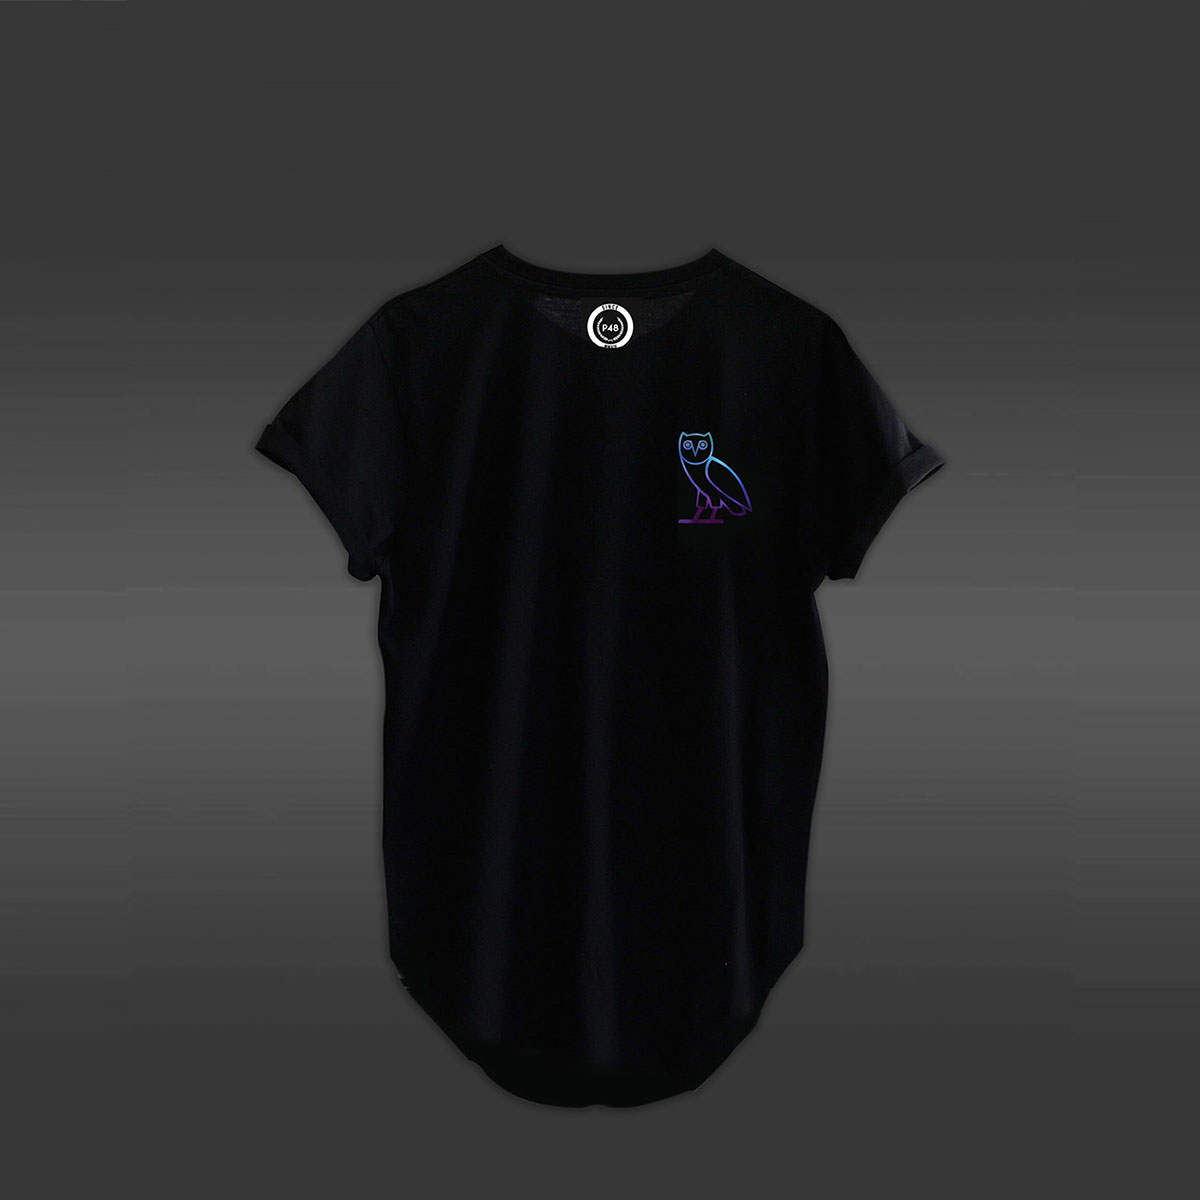 Purple Owl T-shirt - Black